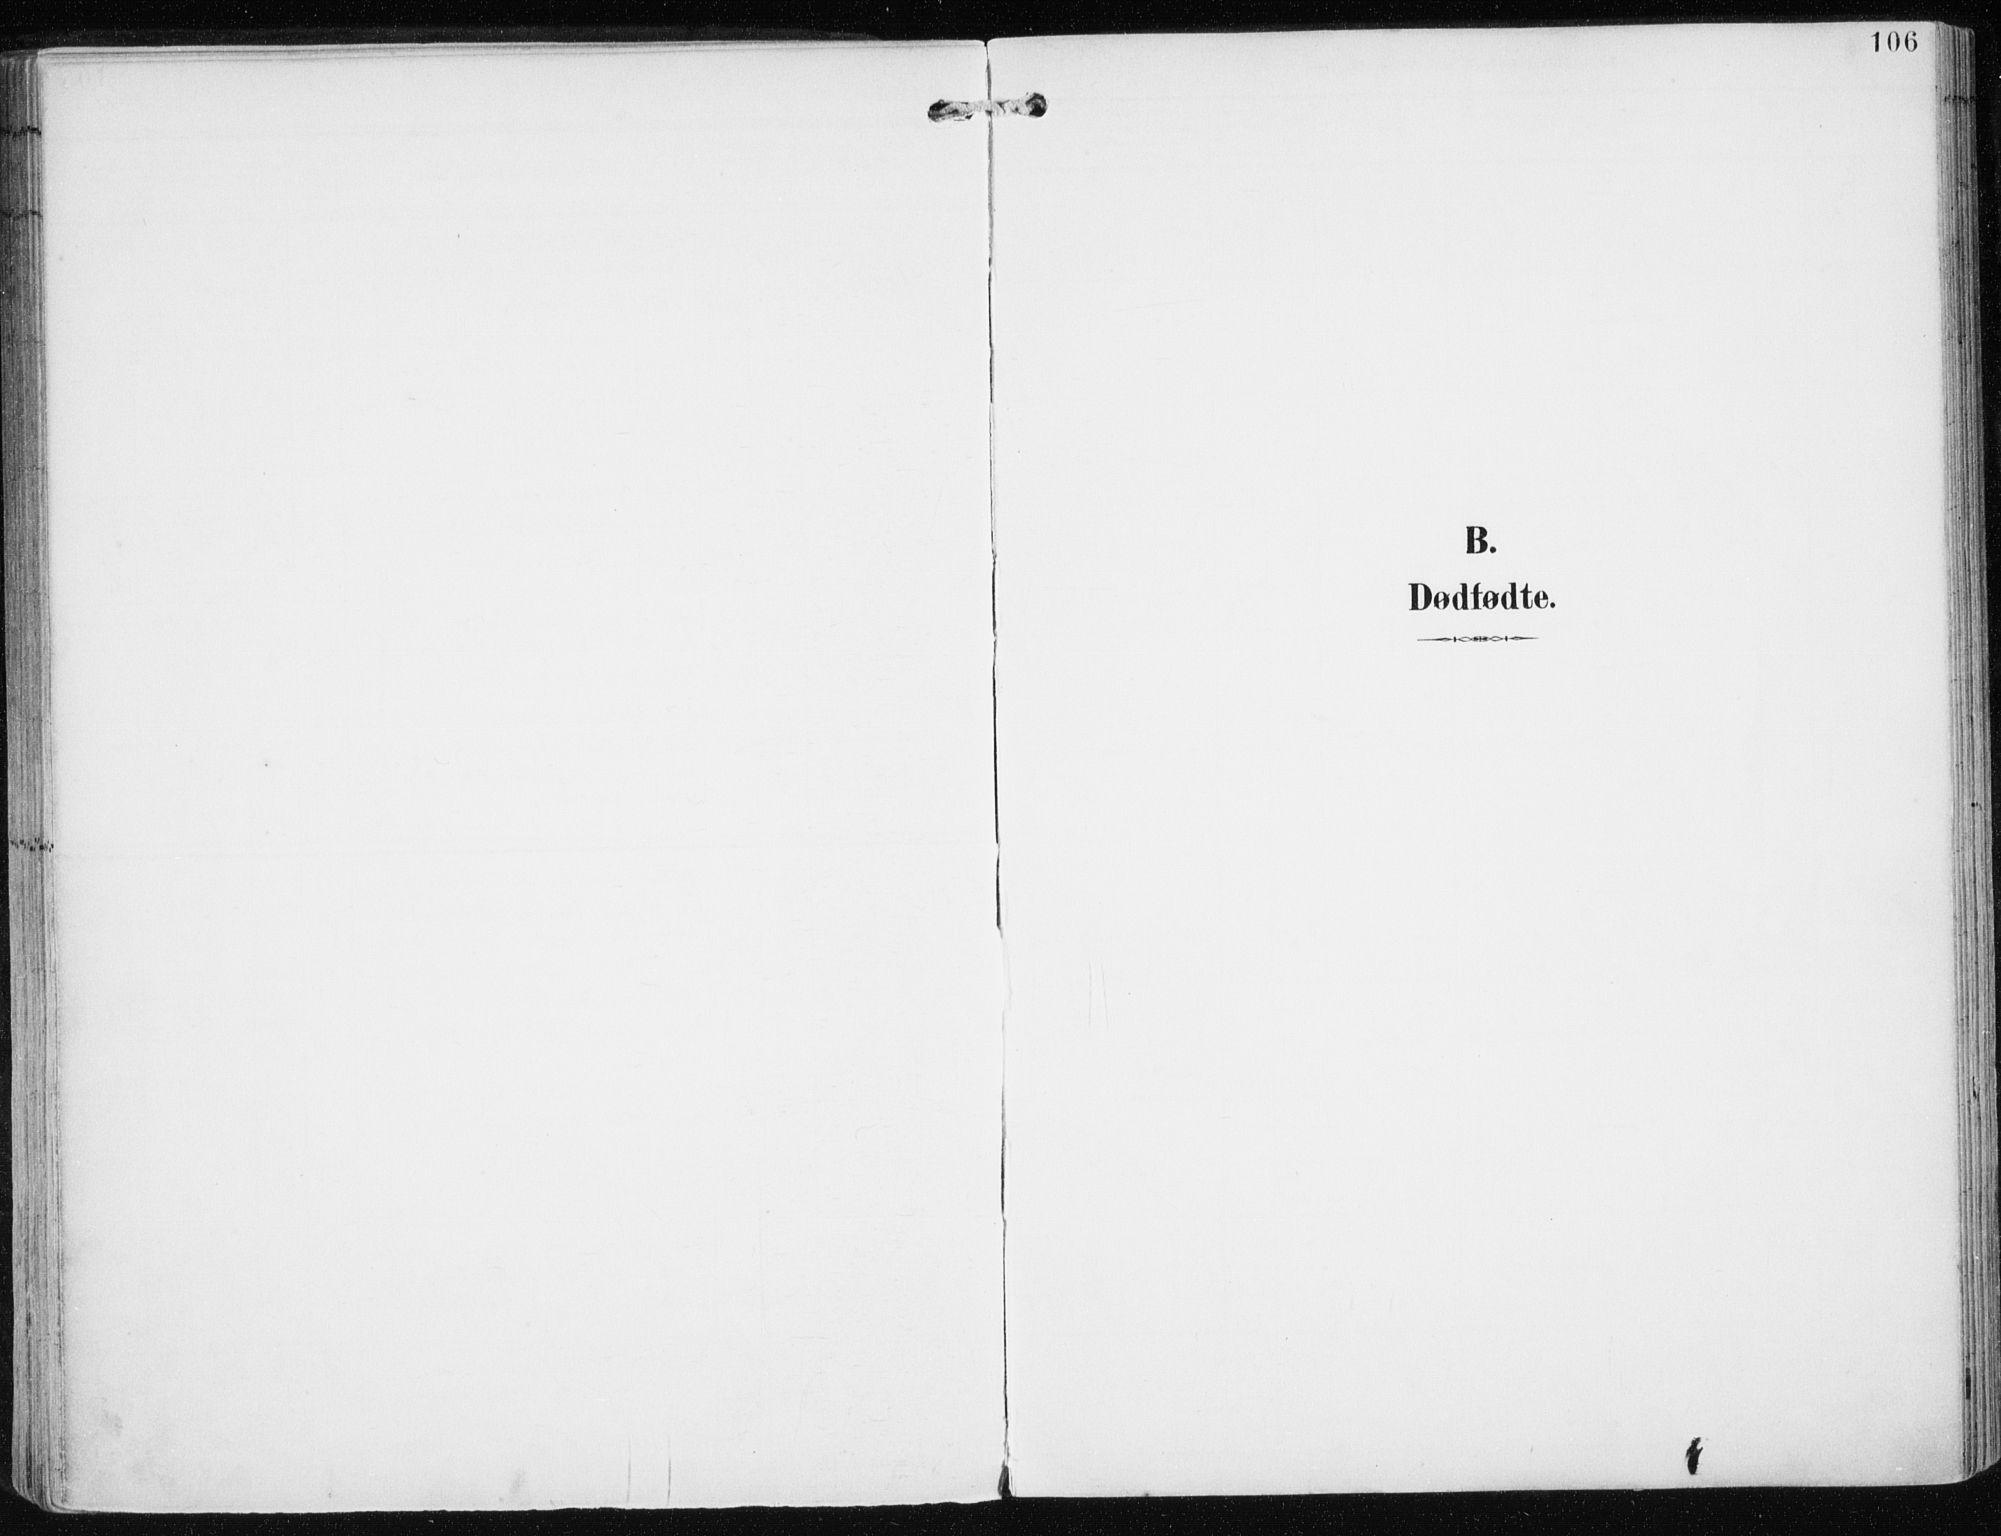 SATØ, Skjervøy sokneprestkontor, H/Ha/Haa/L0017kirke: Ministerialbok nr. 17, 1895-1911, s. 106